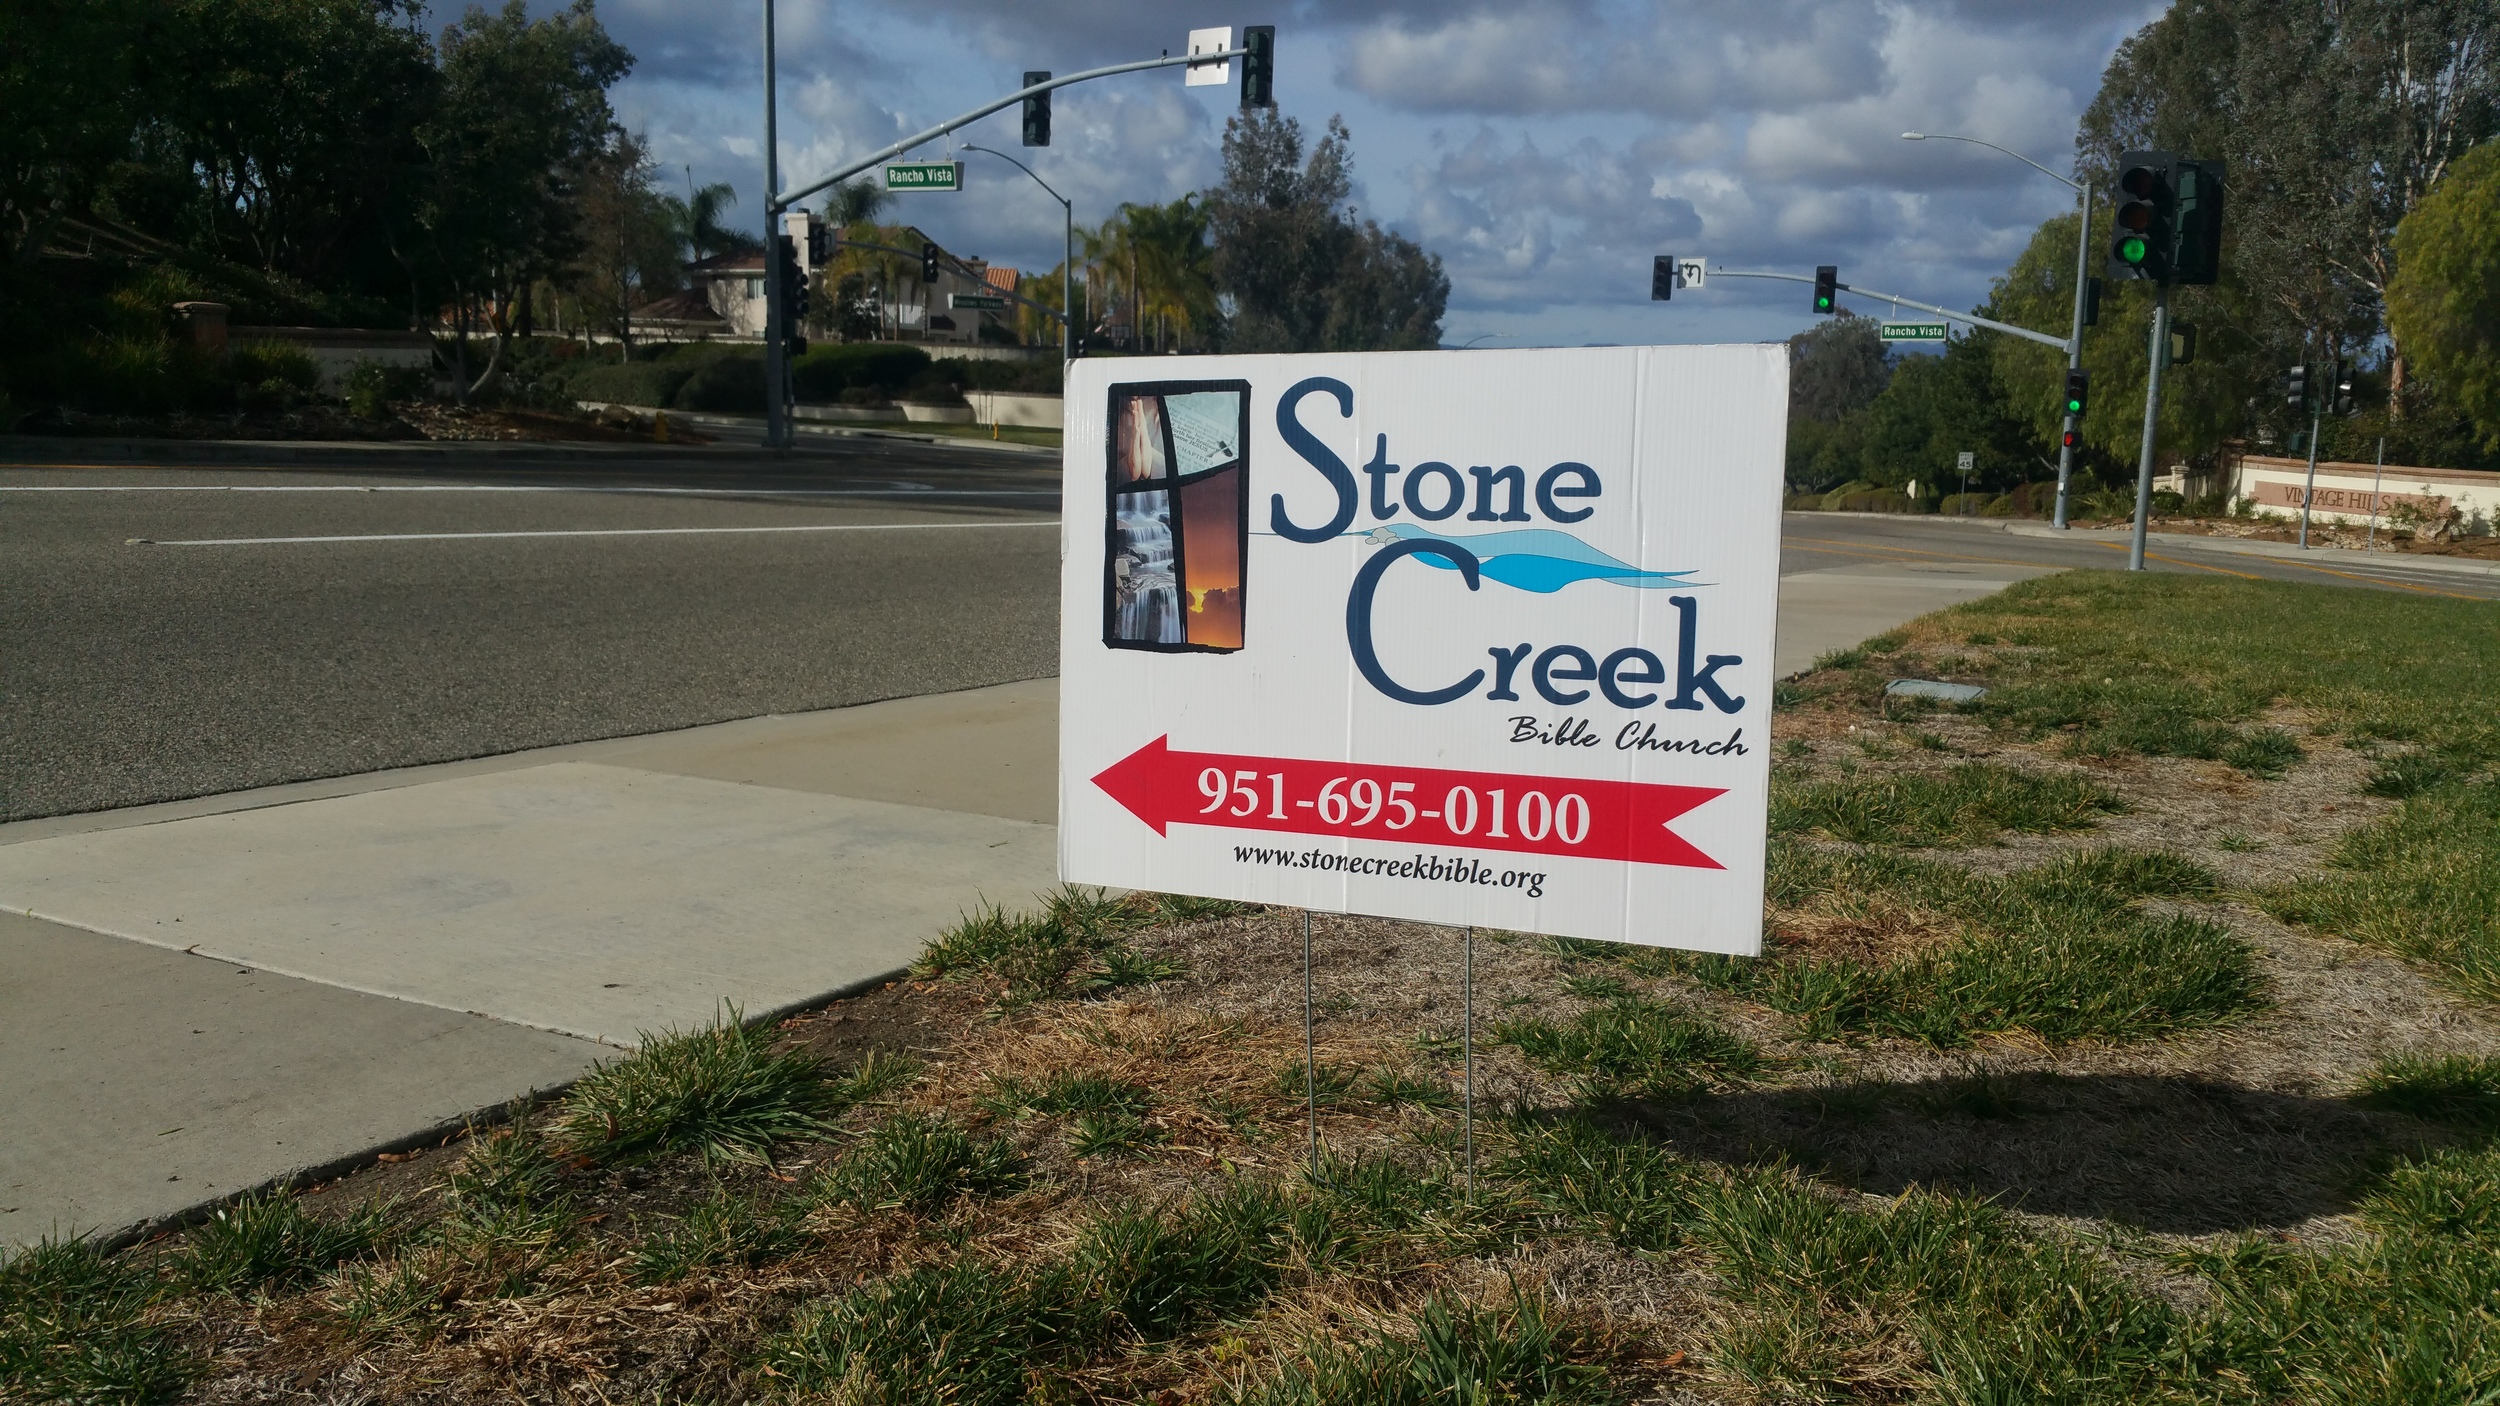 Stone creek Bible church, Temecula, CA